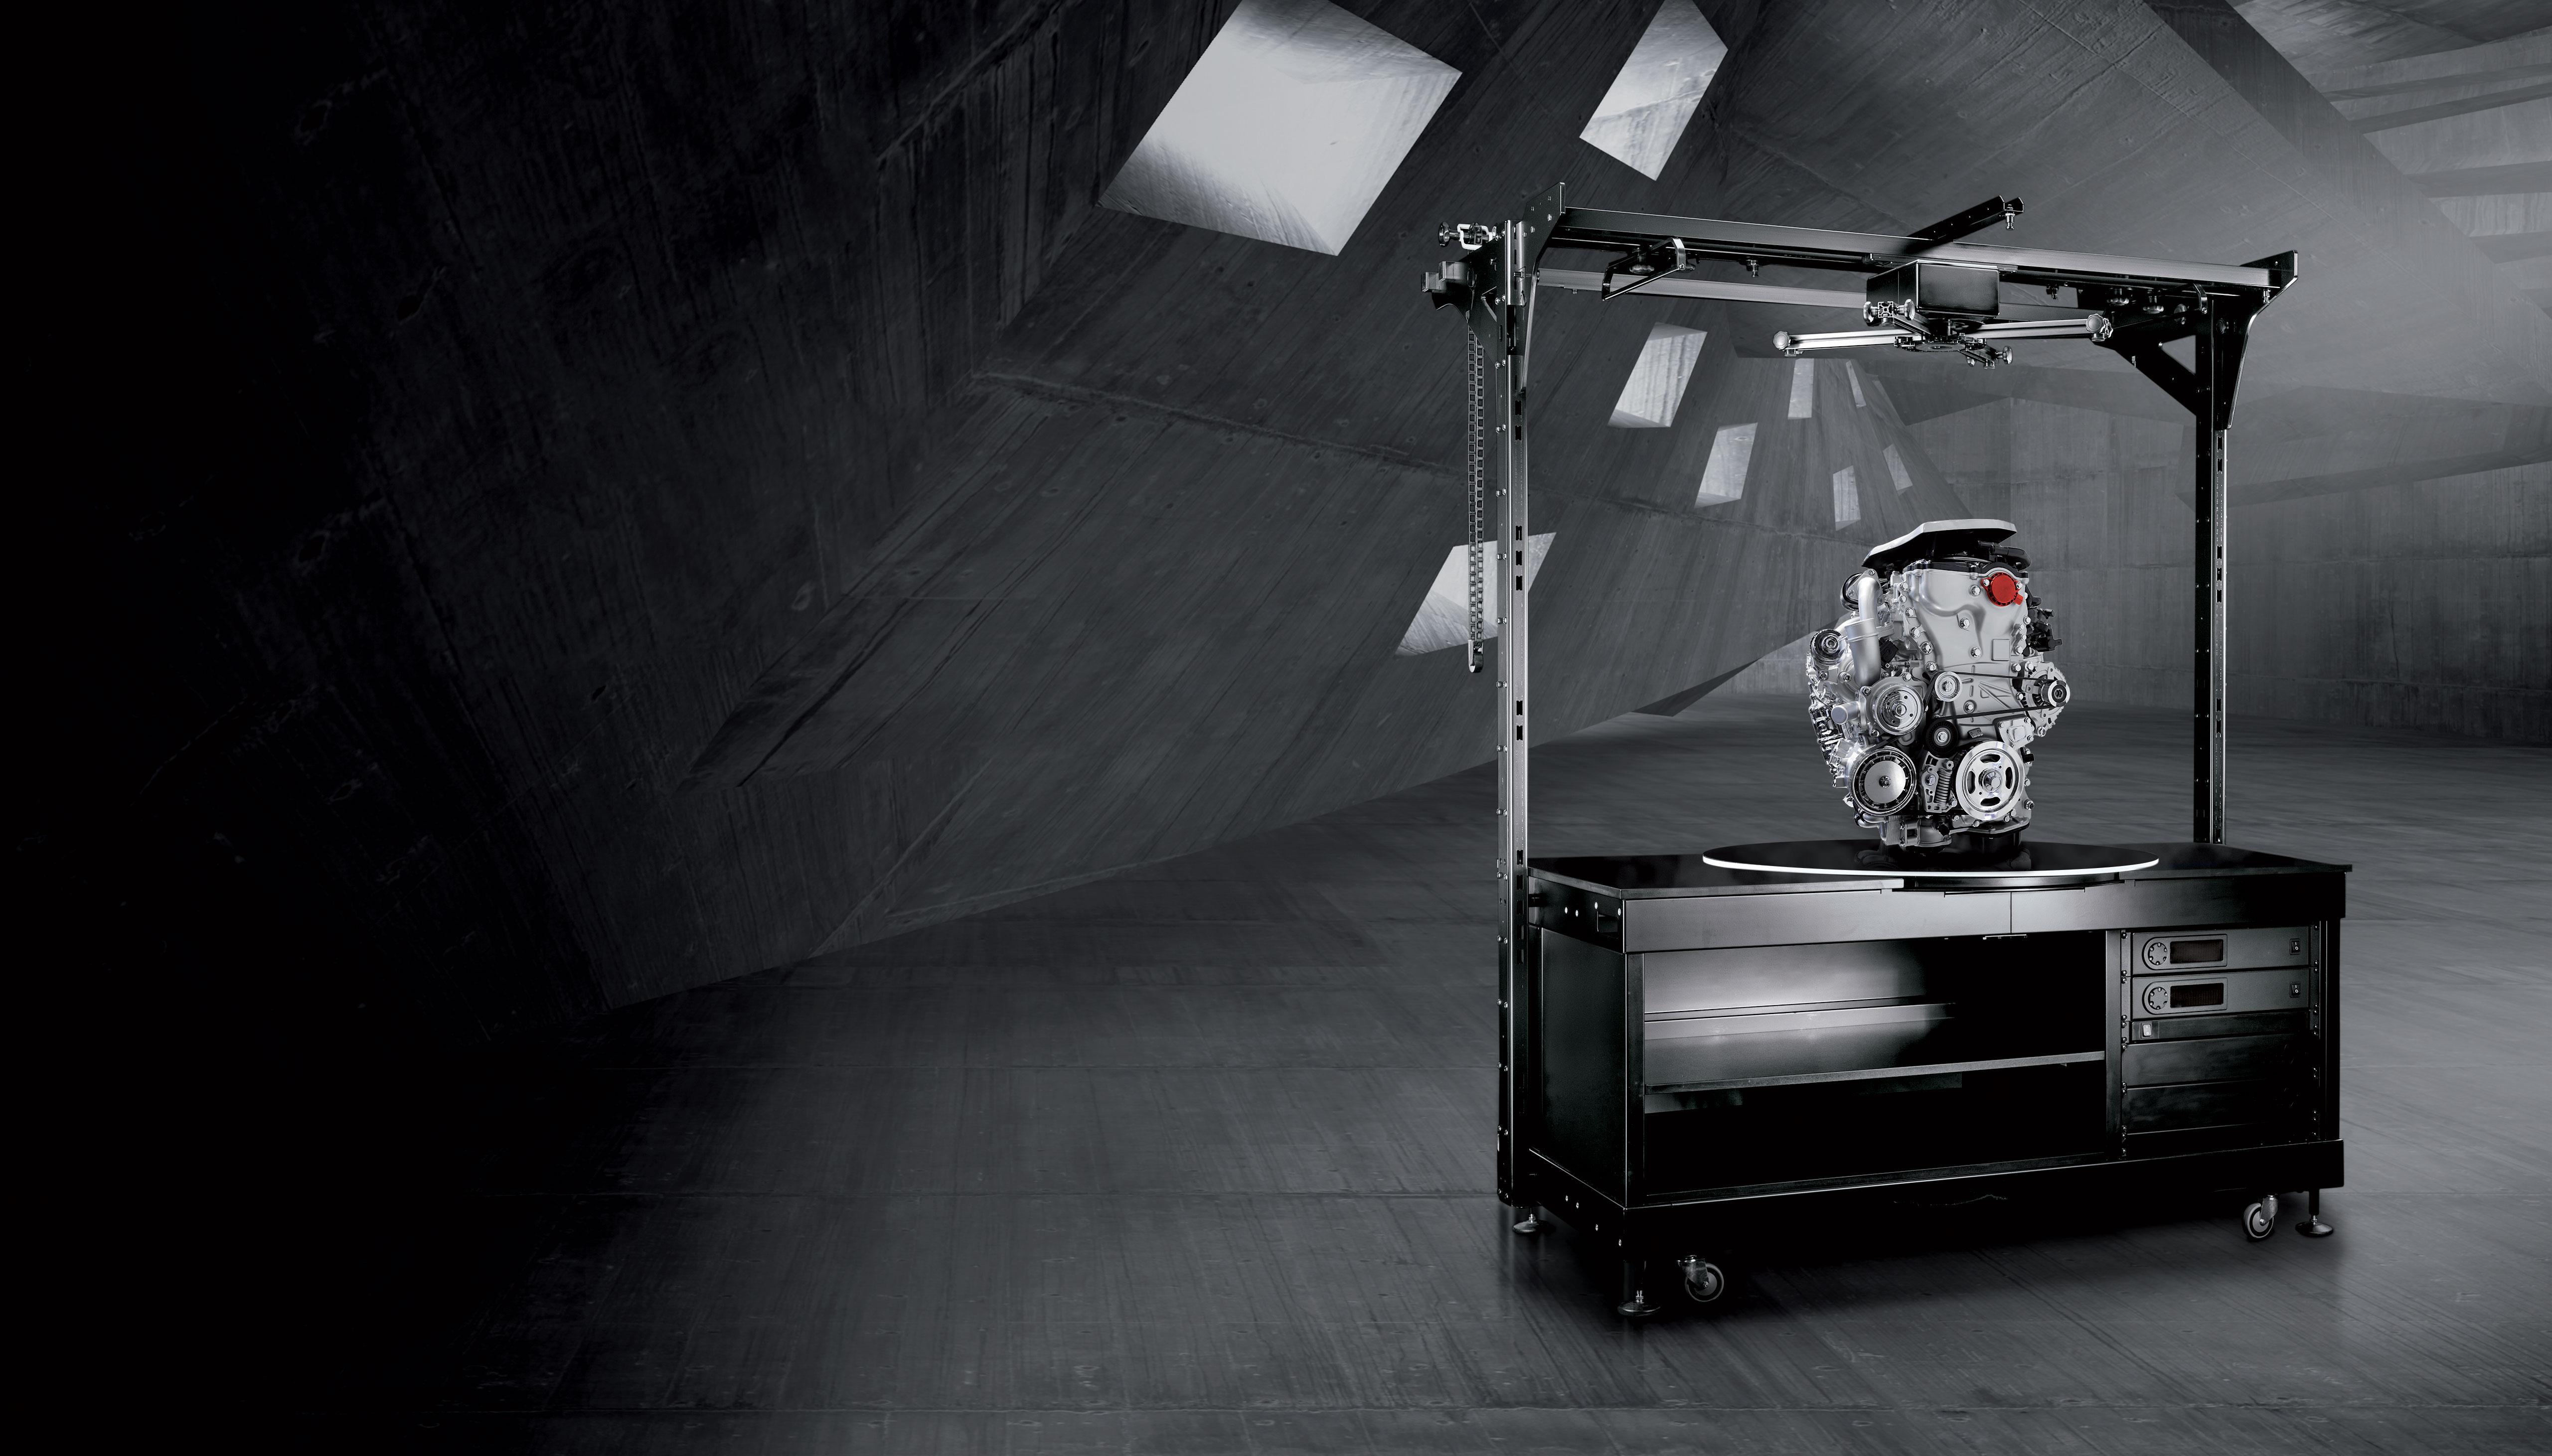 PhotoRobot heavy duty robotic turntable while shooting heavy engine